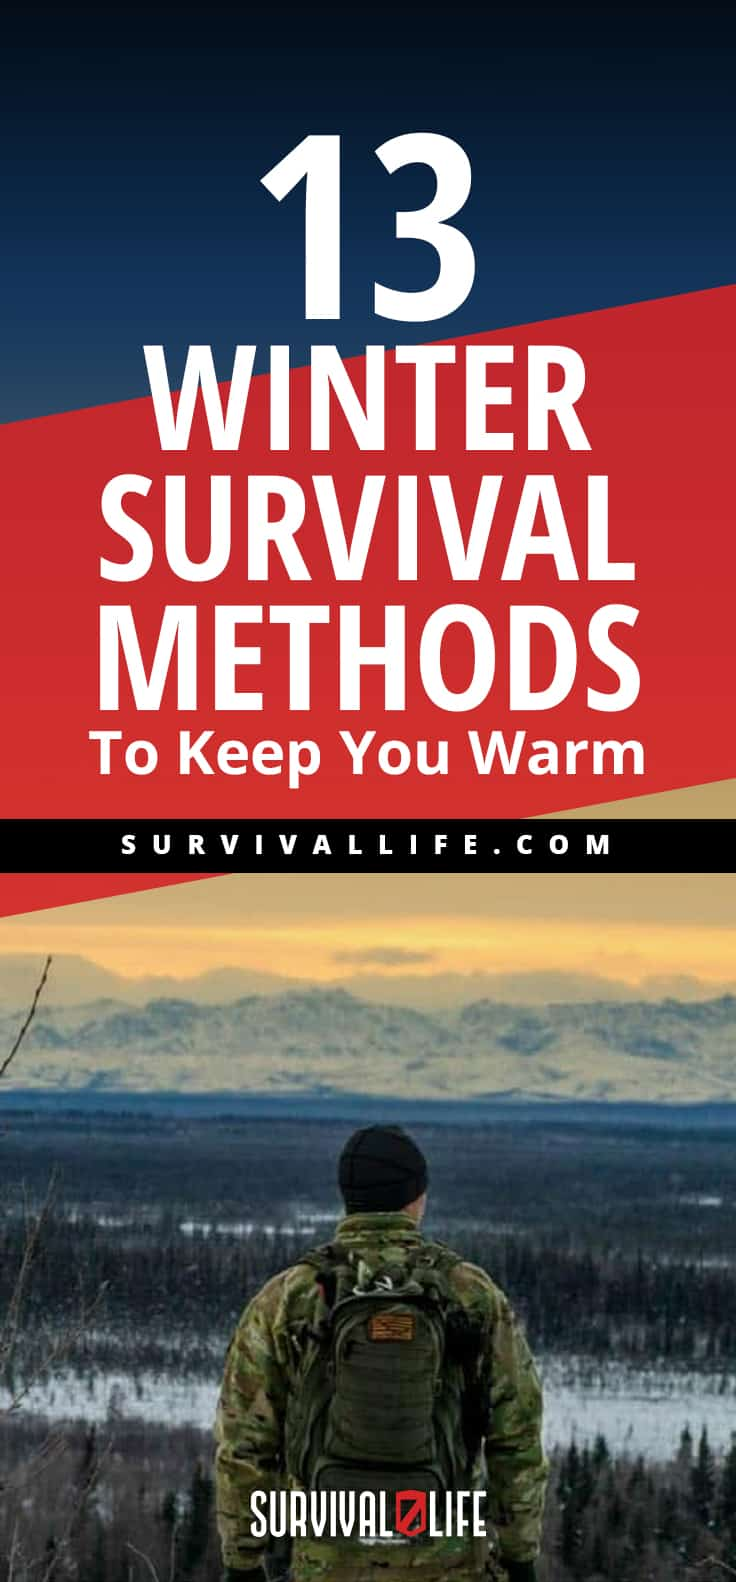 13 Winter Survival Methods To Keep You Warm | Winter Survival Skills